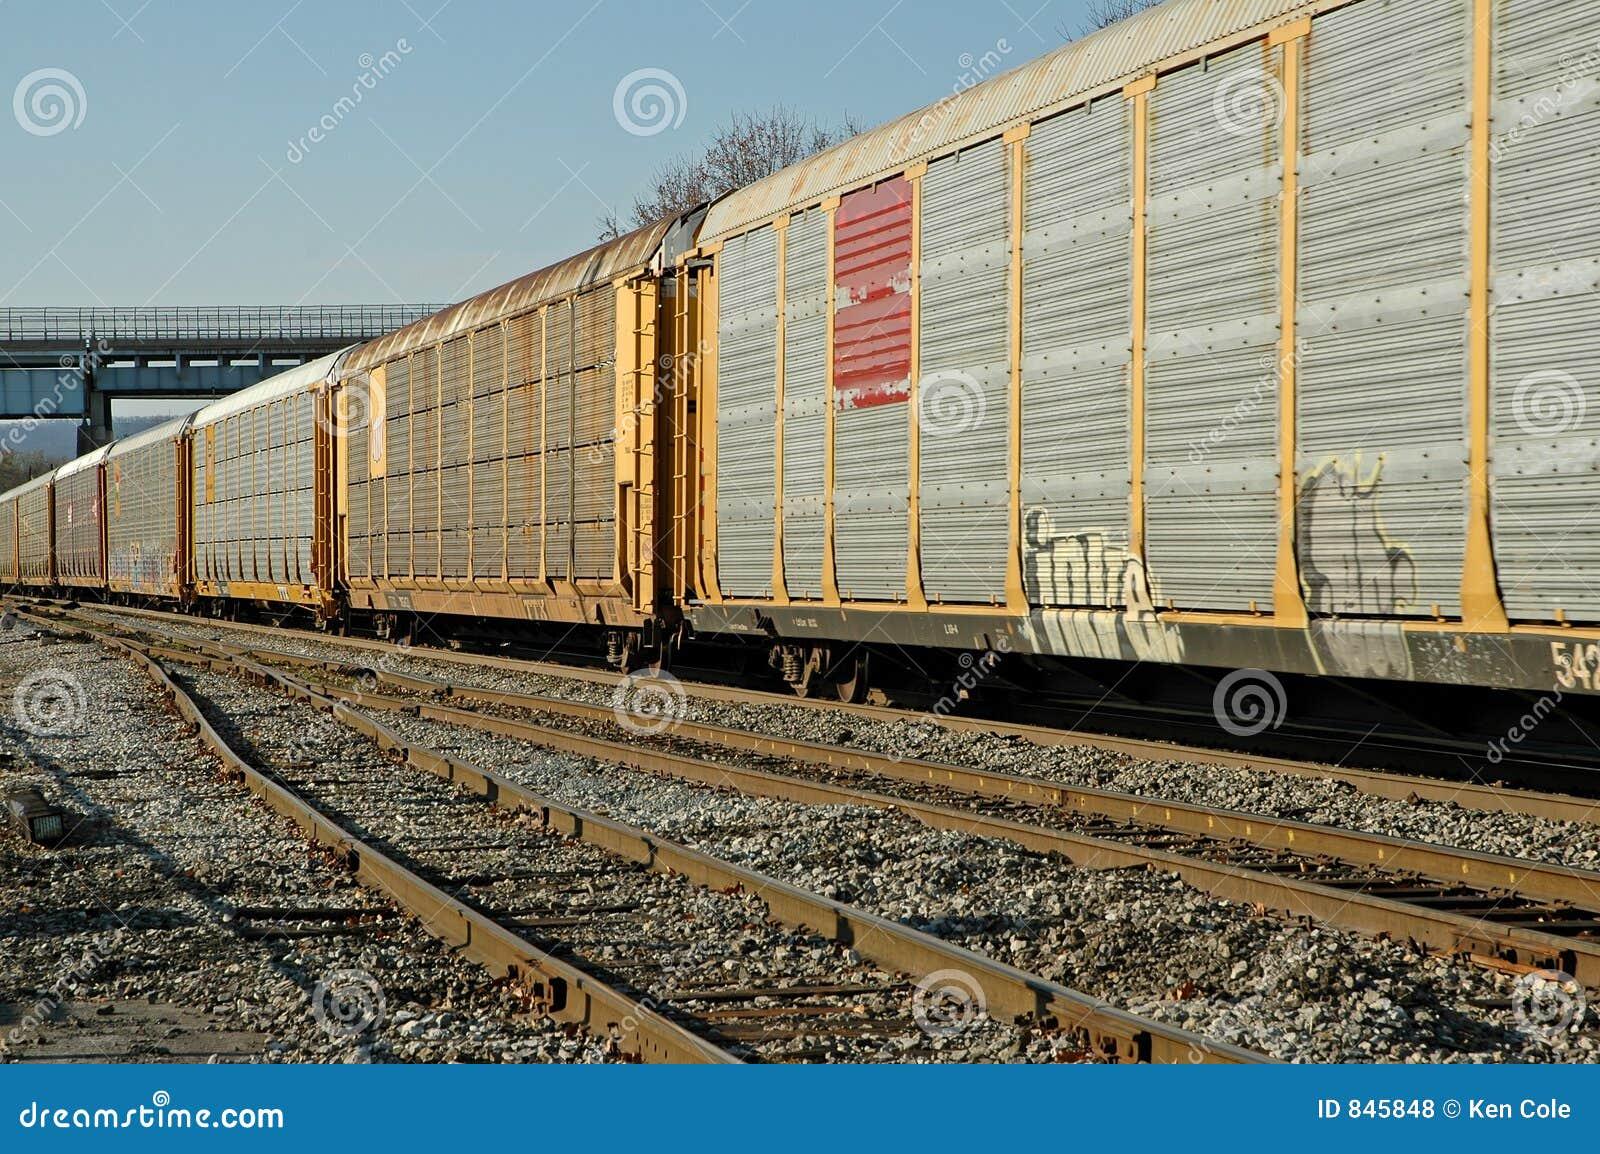 Railroad Freight Train